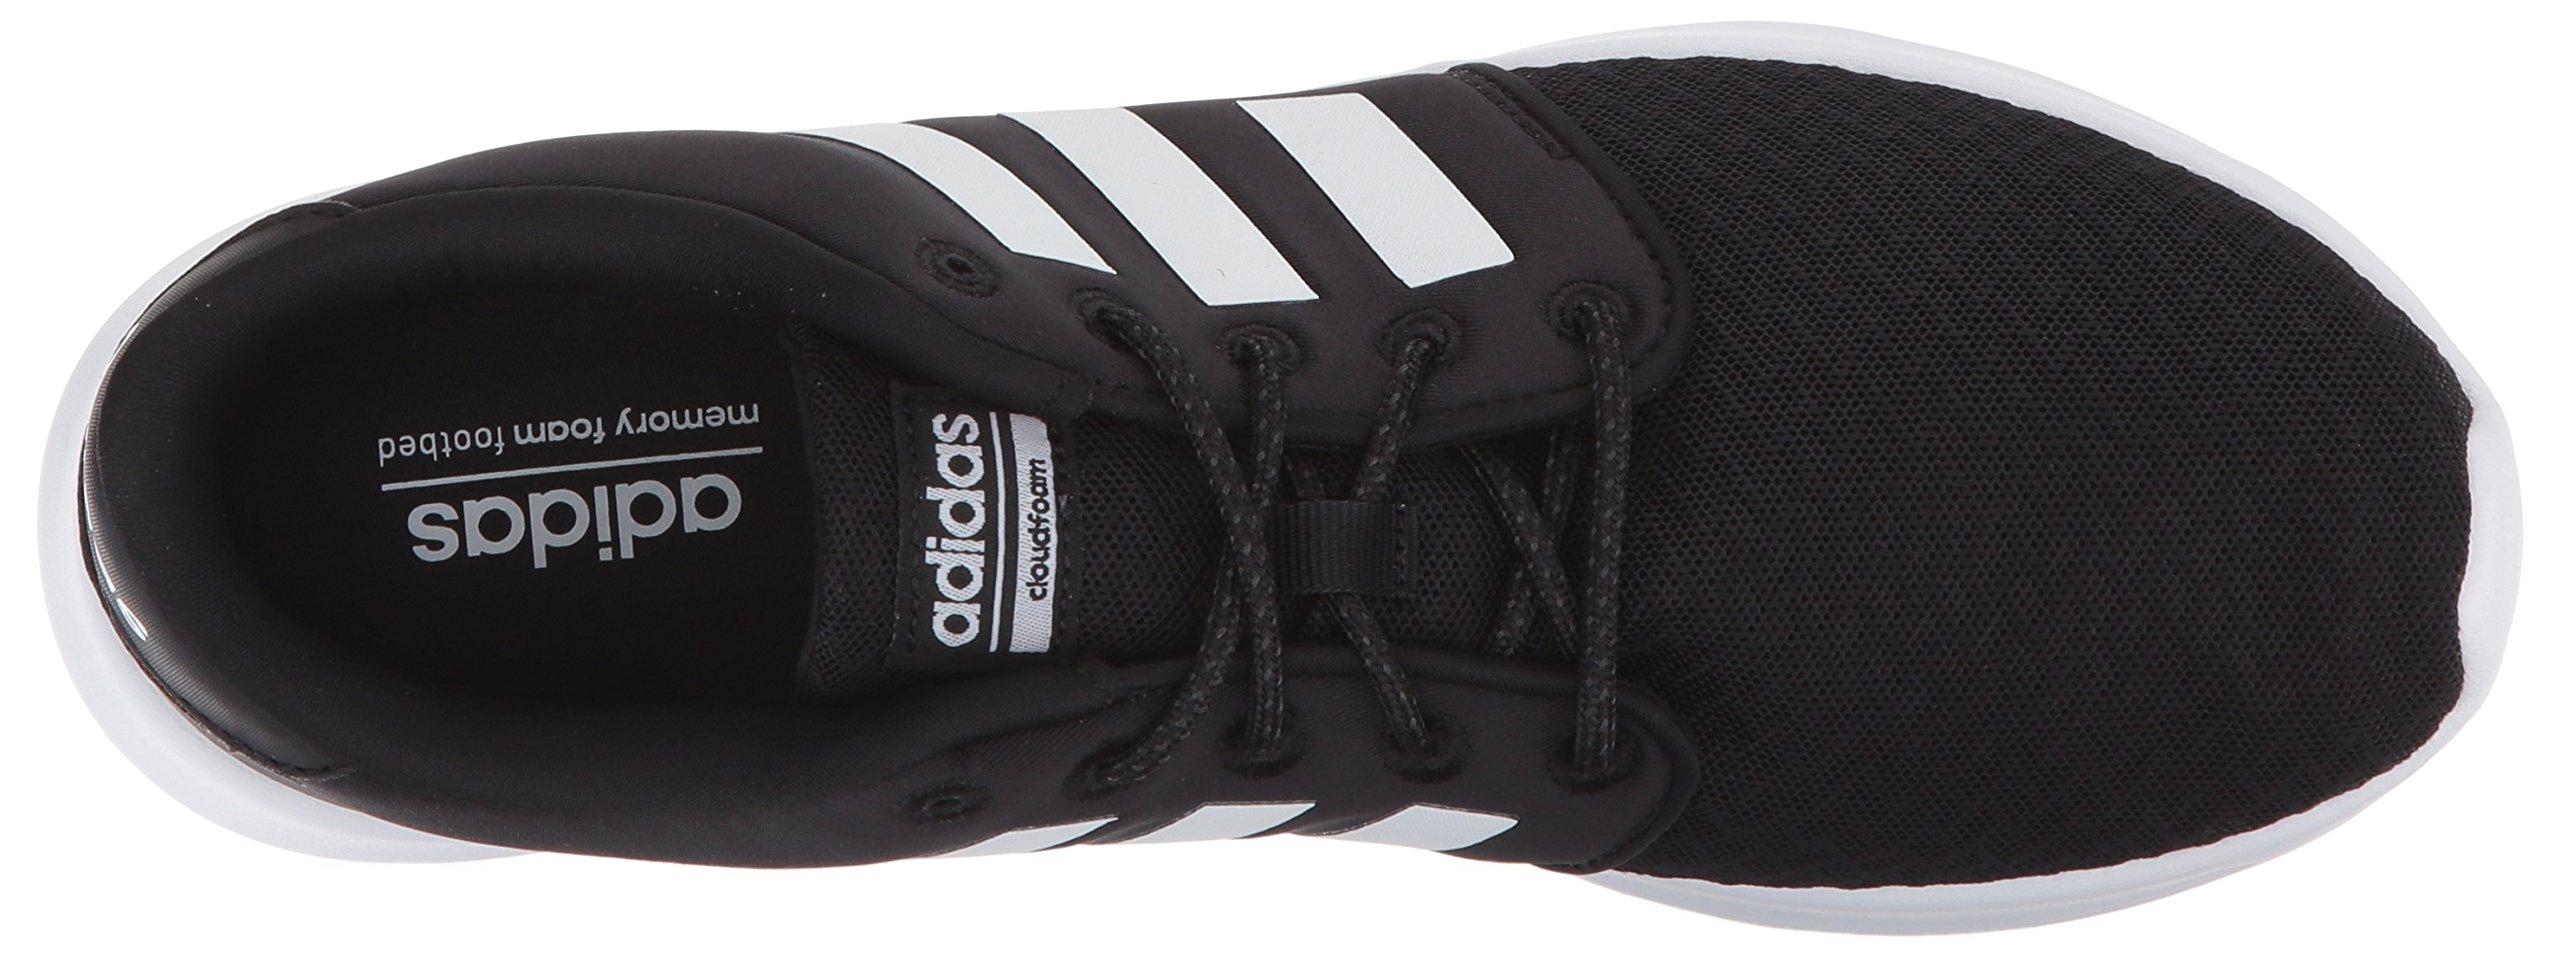 adidas Women's Cloudfoam QT Racer Running Shoe, Black/White/Carbon, 5 M US by adidas (Image #8)